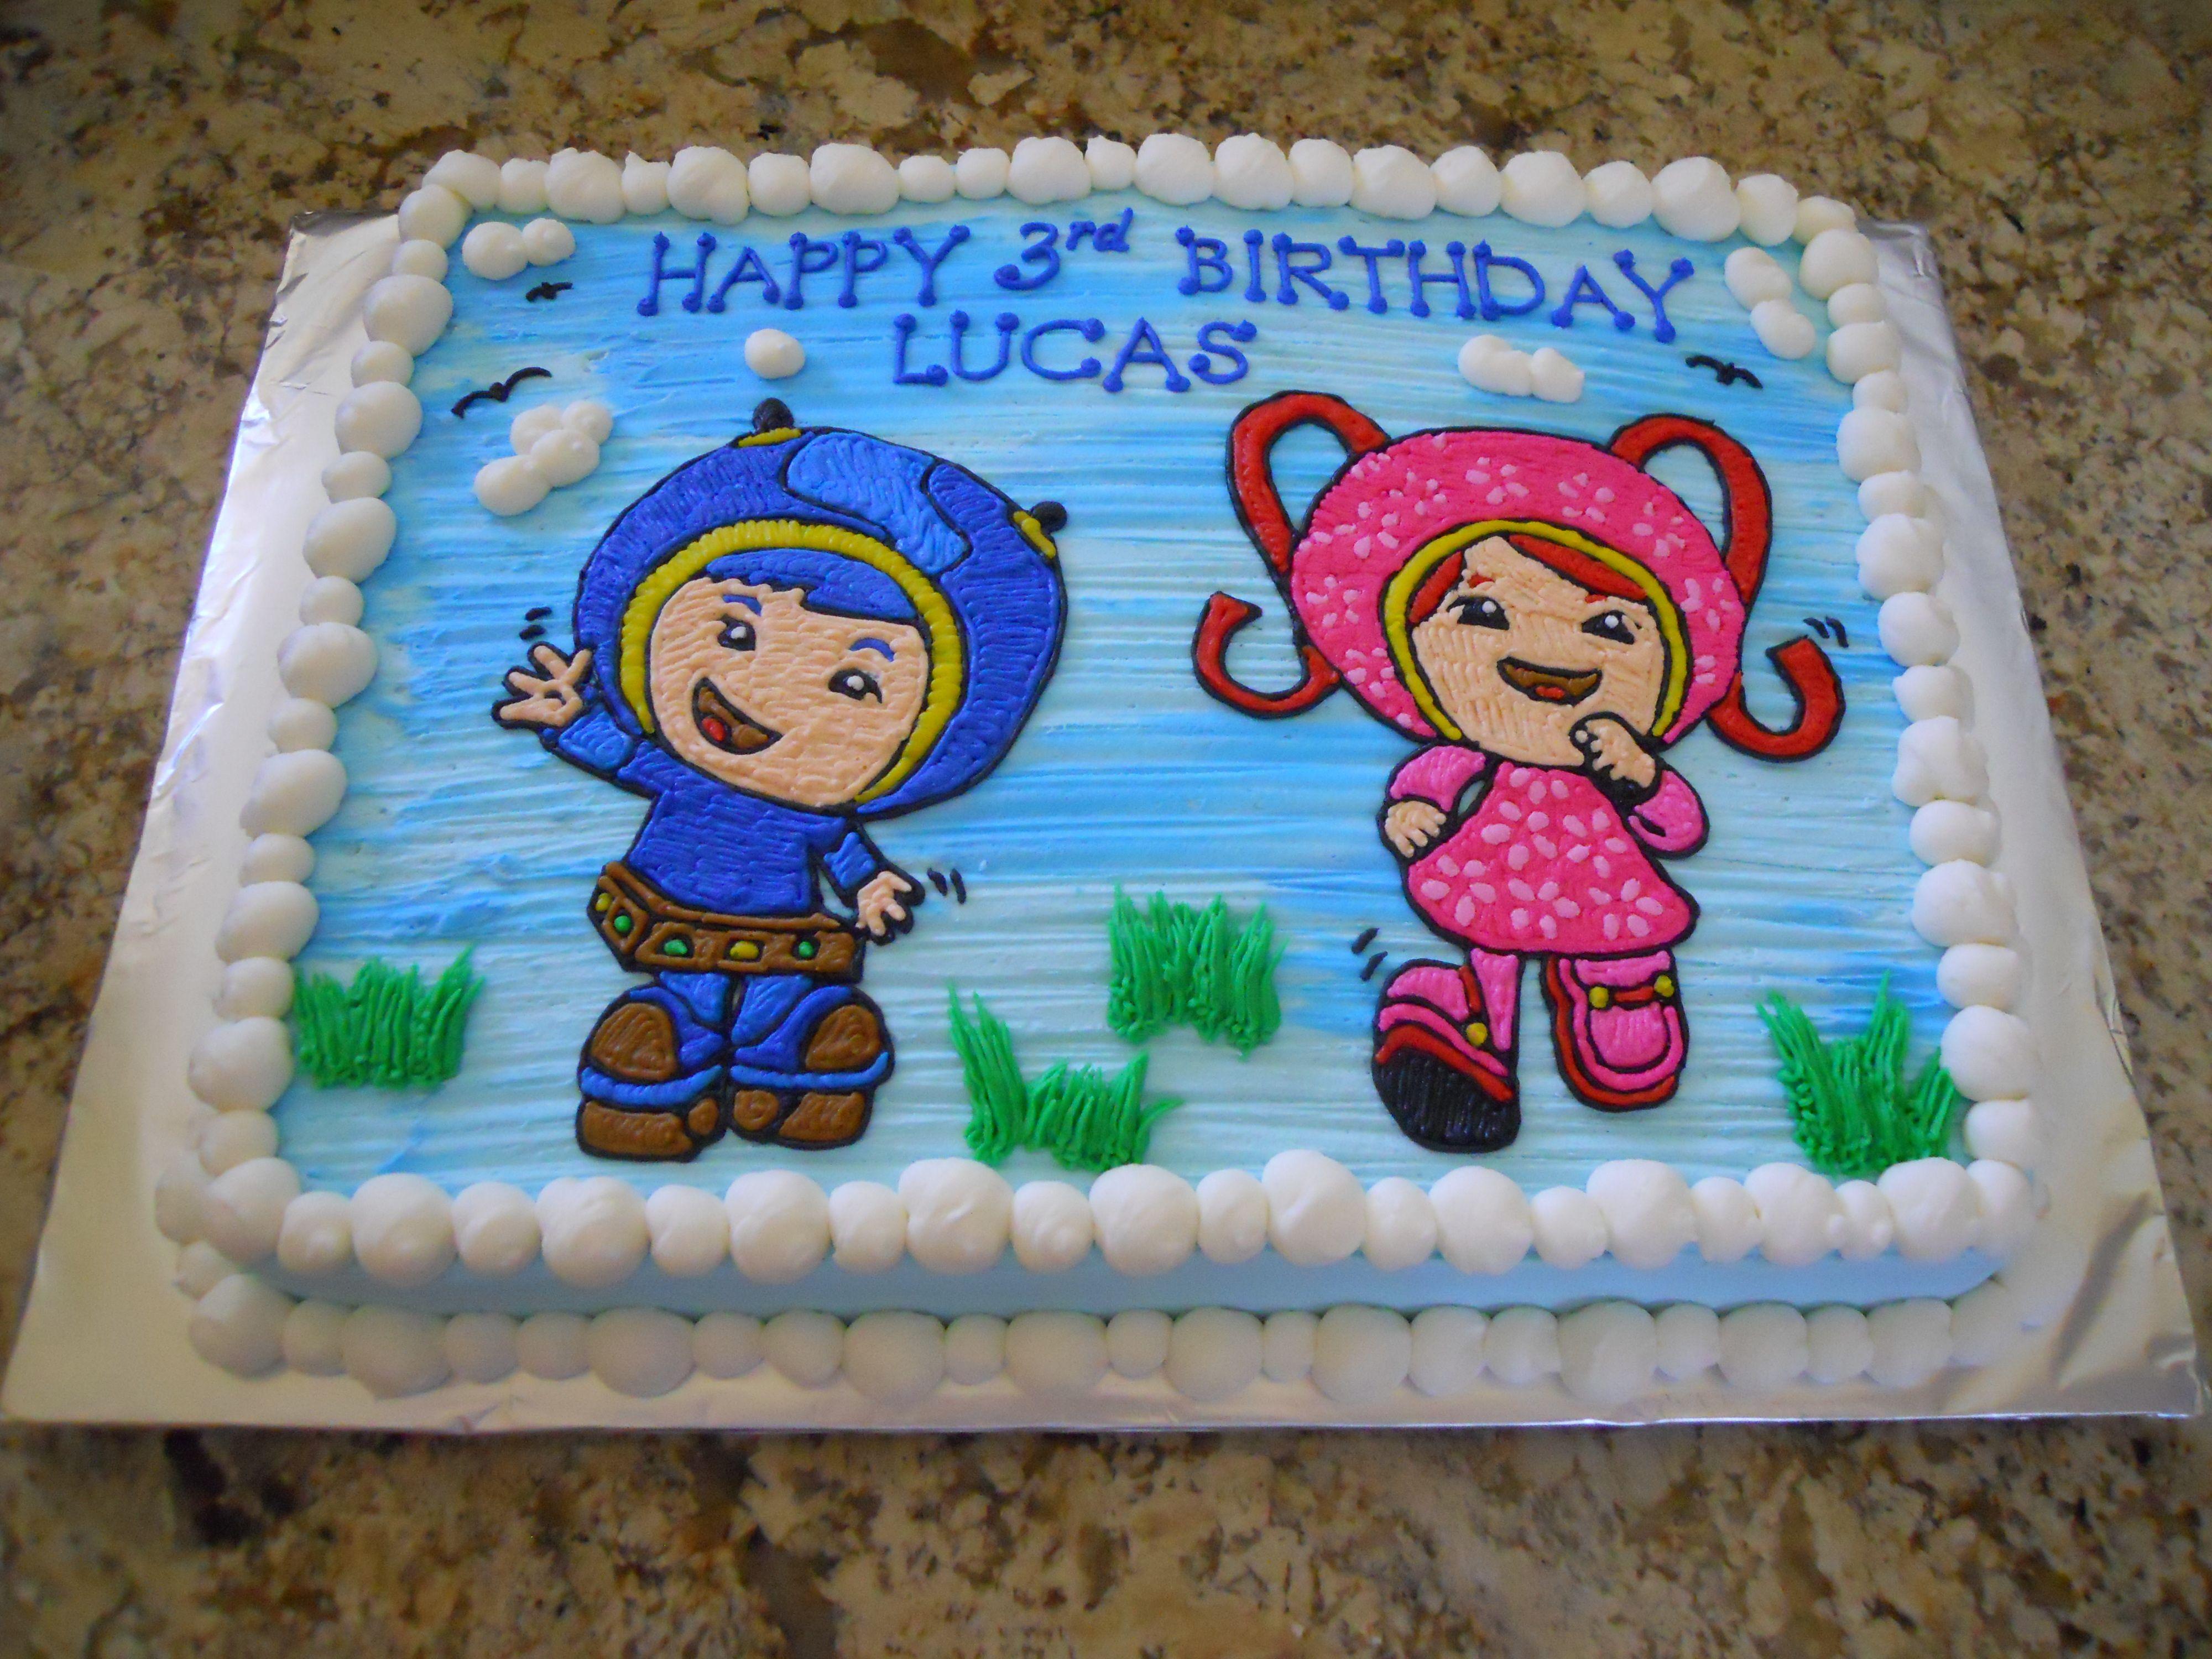 Pleasant Team Umizoomi Birthday Cake With Images Team Umizoomi Personalised Birthday Cards Arneslily Jamesorg